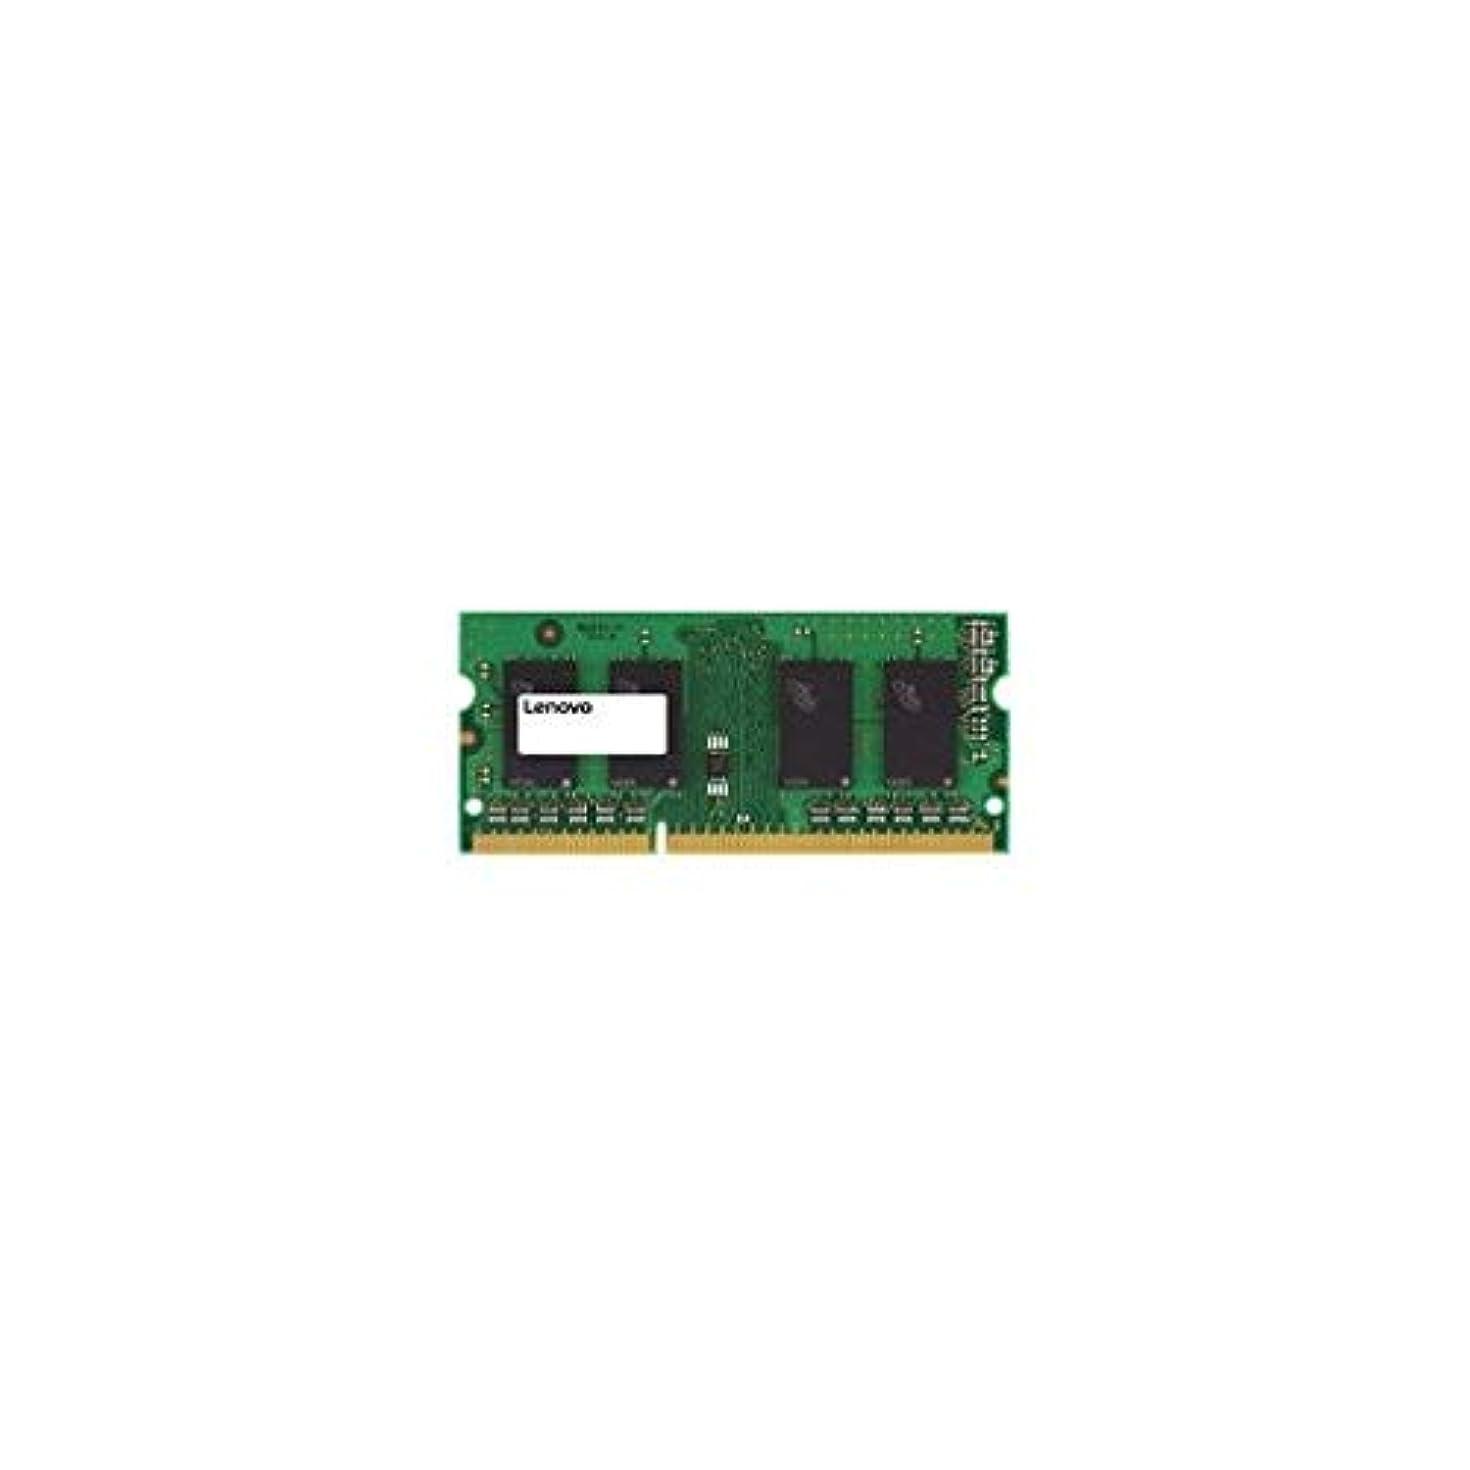 Comp XP New Genuine Ram For Lenovo Thinkpad Yoga 8GB DDR3L 1600 SODIMM Memory 03X6657